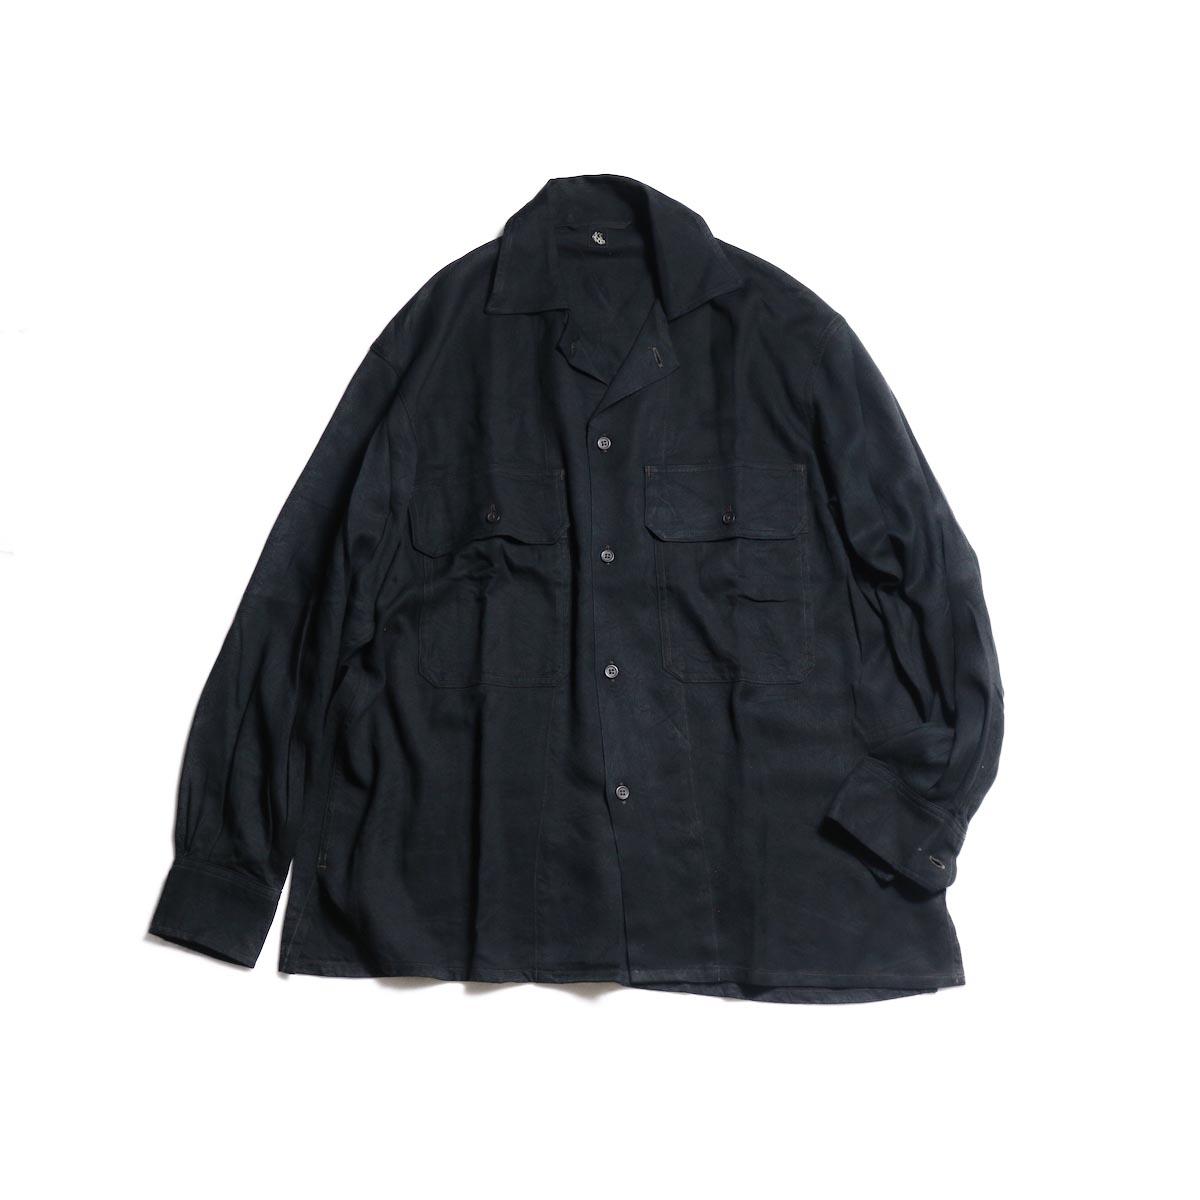 Kaptain Sunshine / Open Collar Shirt (Black)